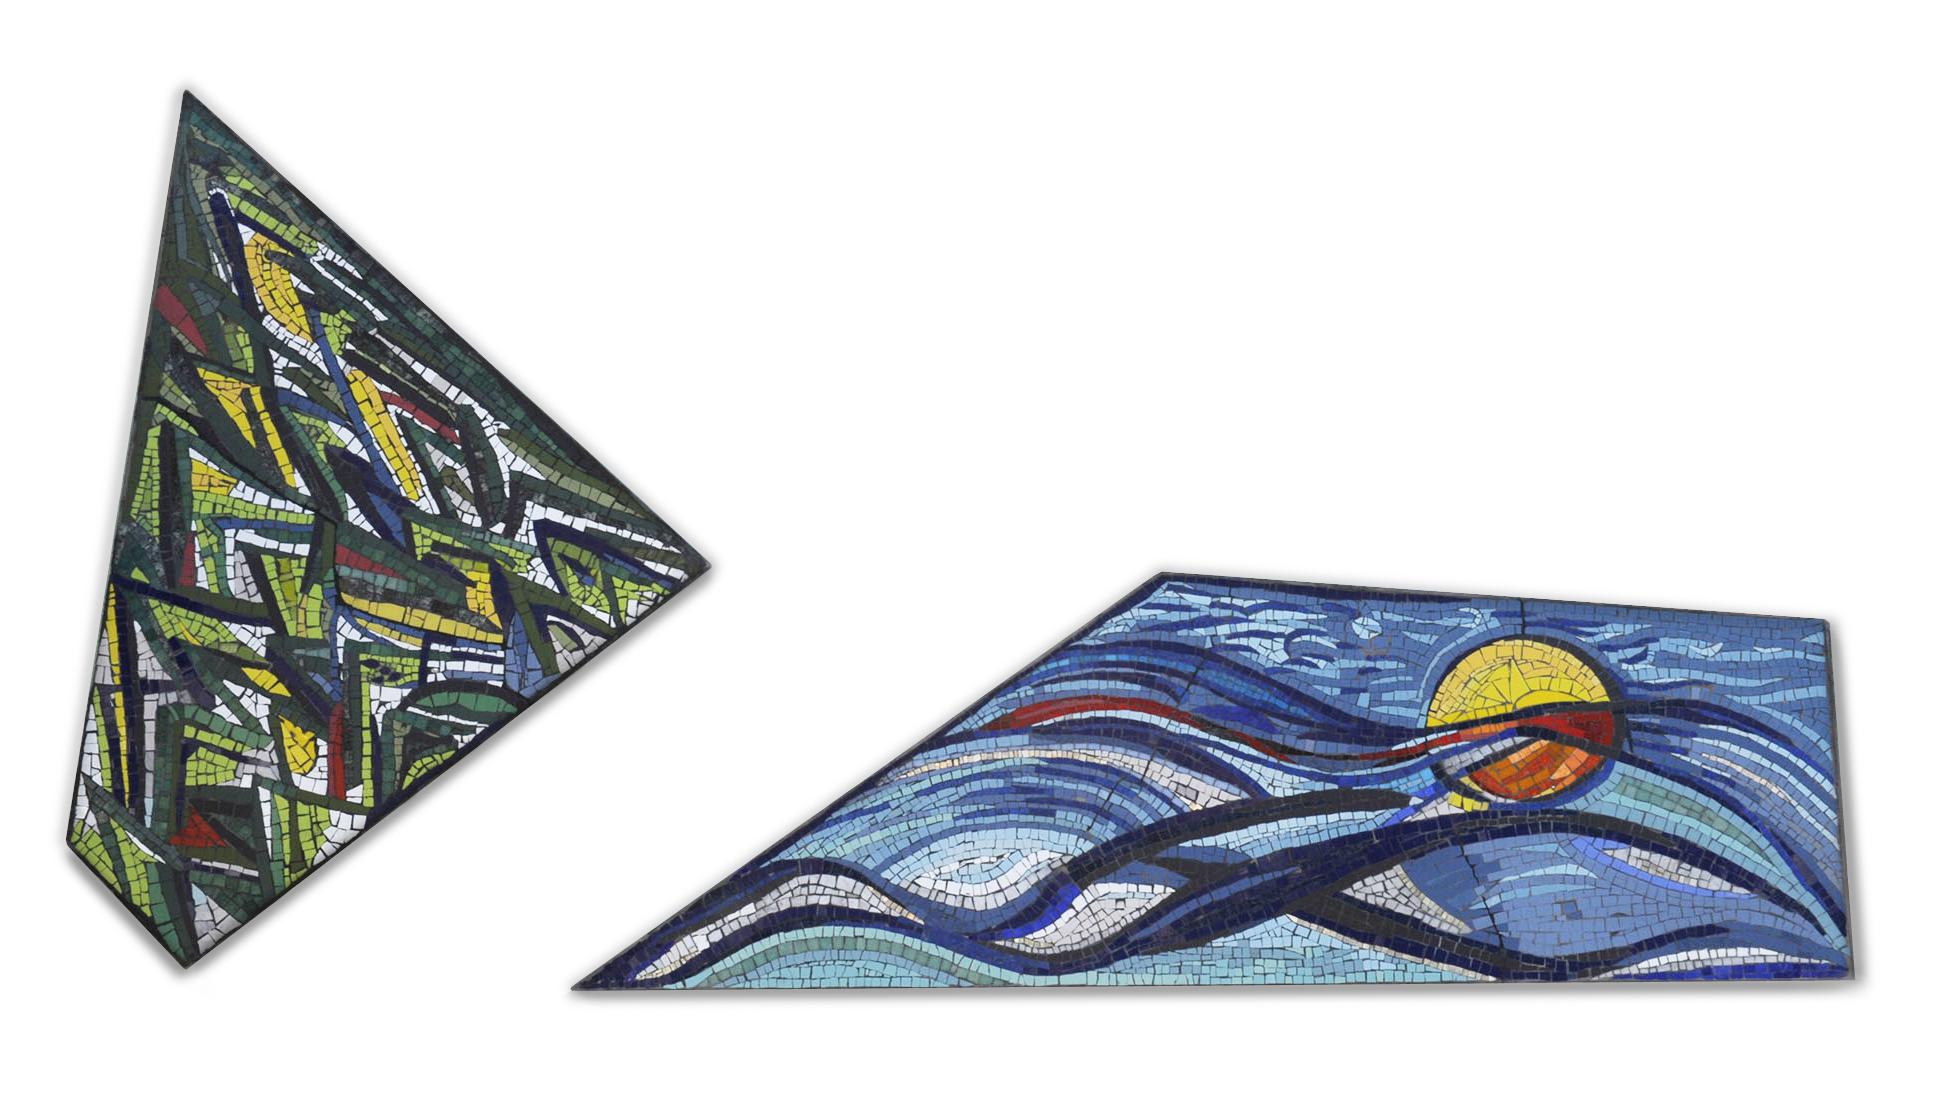 Mosaico a Cembra